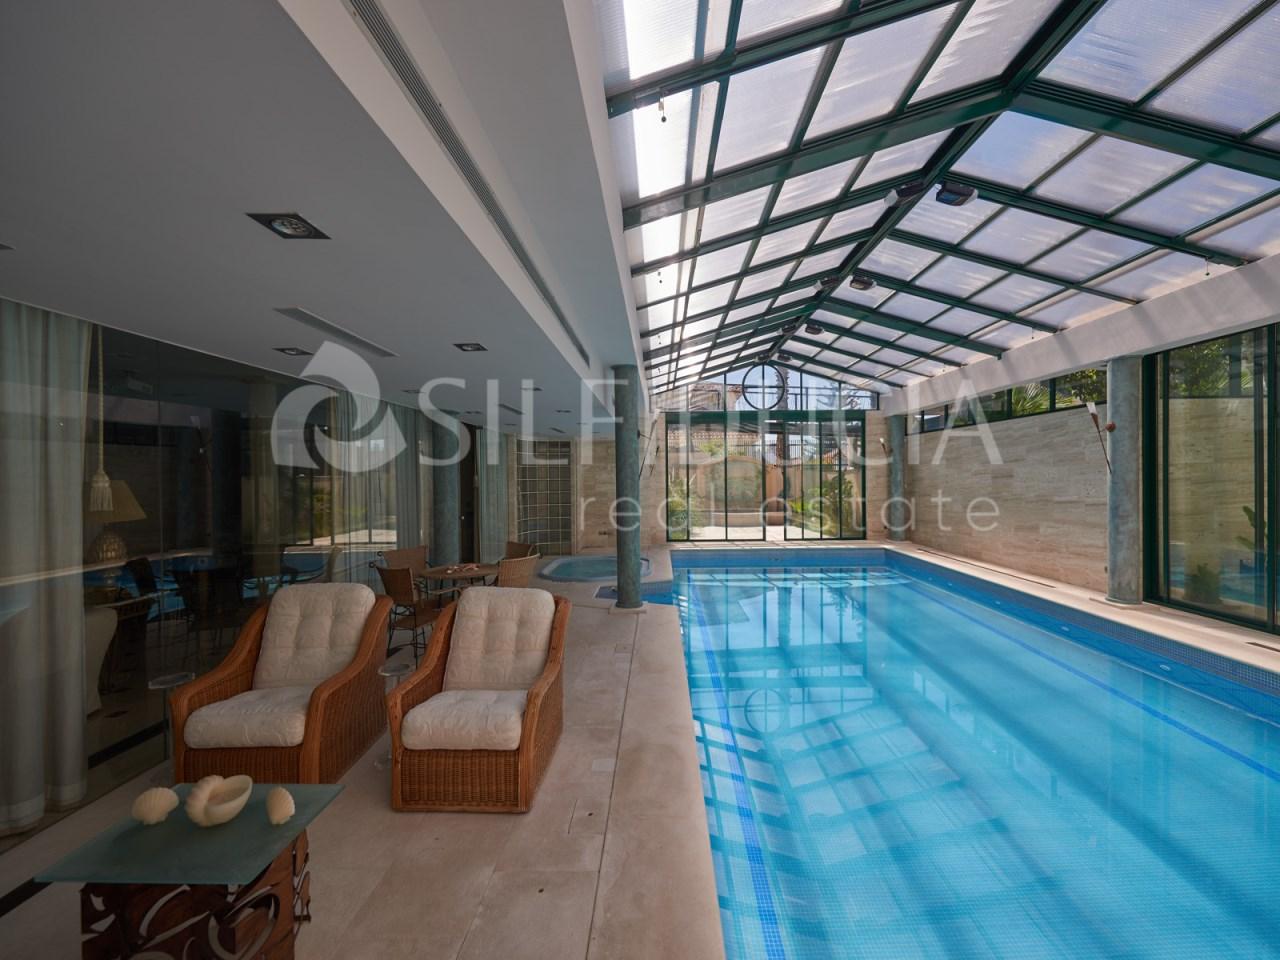 Indoor pool of an elegant villa for sale in Lisbon